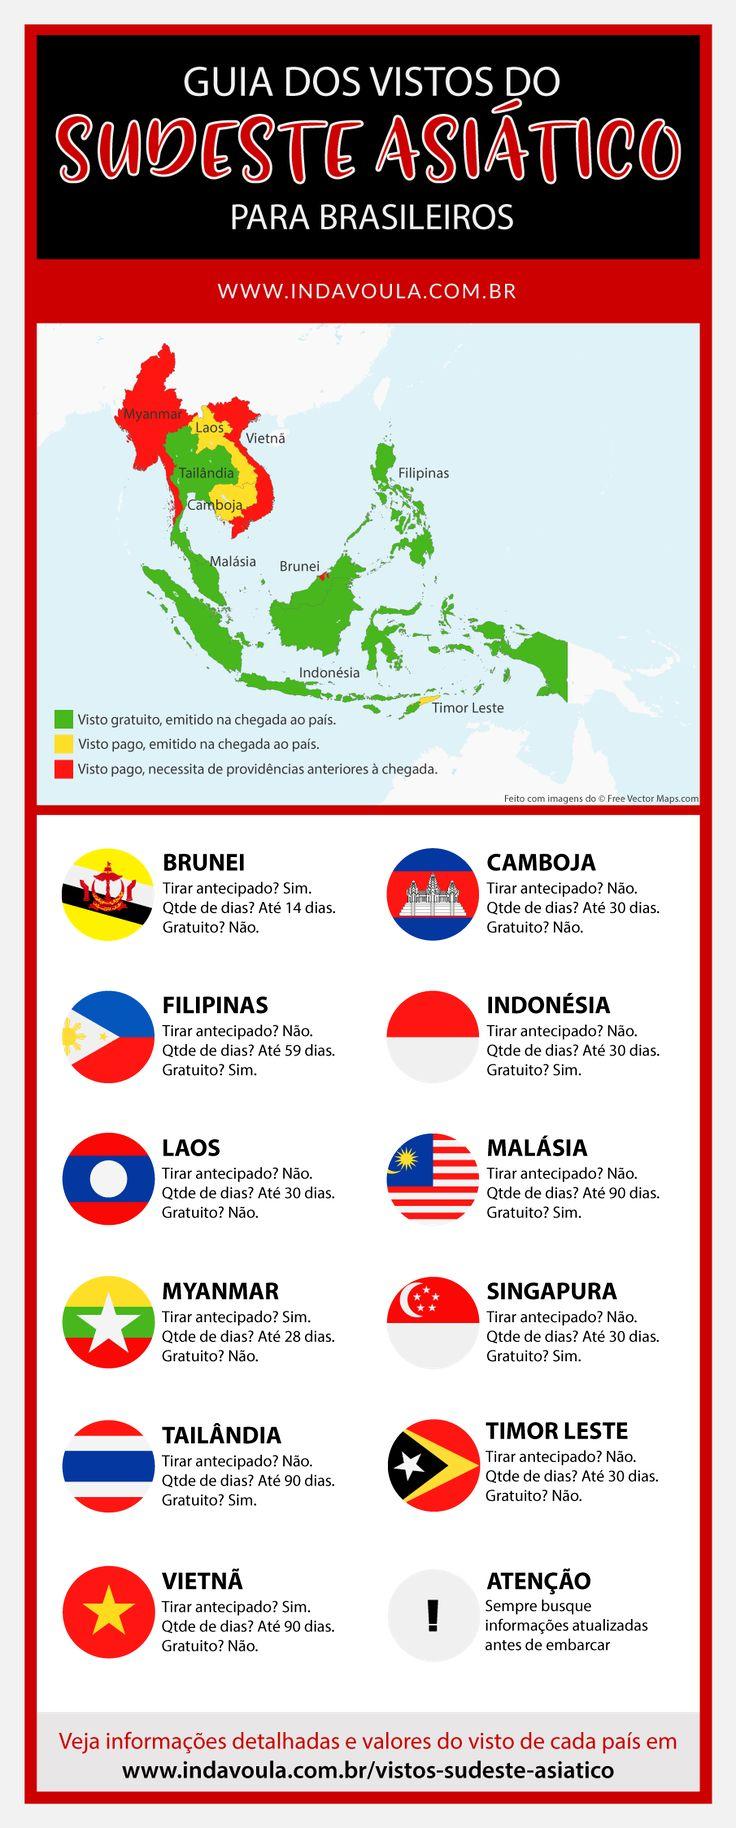 Vistos de turismo para brasileiros no sudeste asiático - Infográfico! Saba tudo sobre os vistos para Tailândia, Indonésia, Laos, Camboja, Vietnã, Malásia, Myanmar, Singapura, Filipinas, Brunei e Timor Leste.